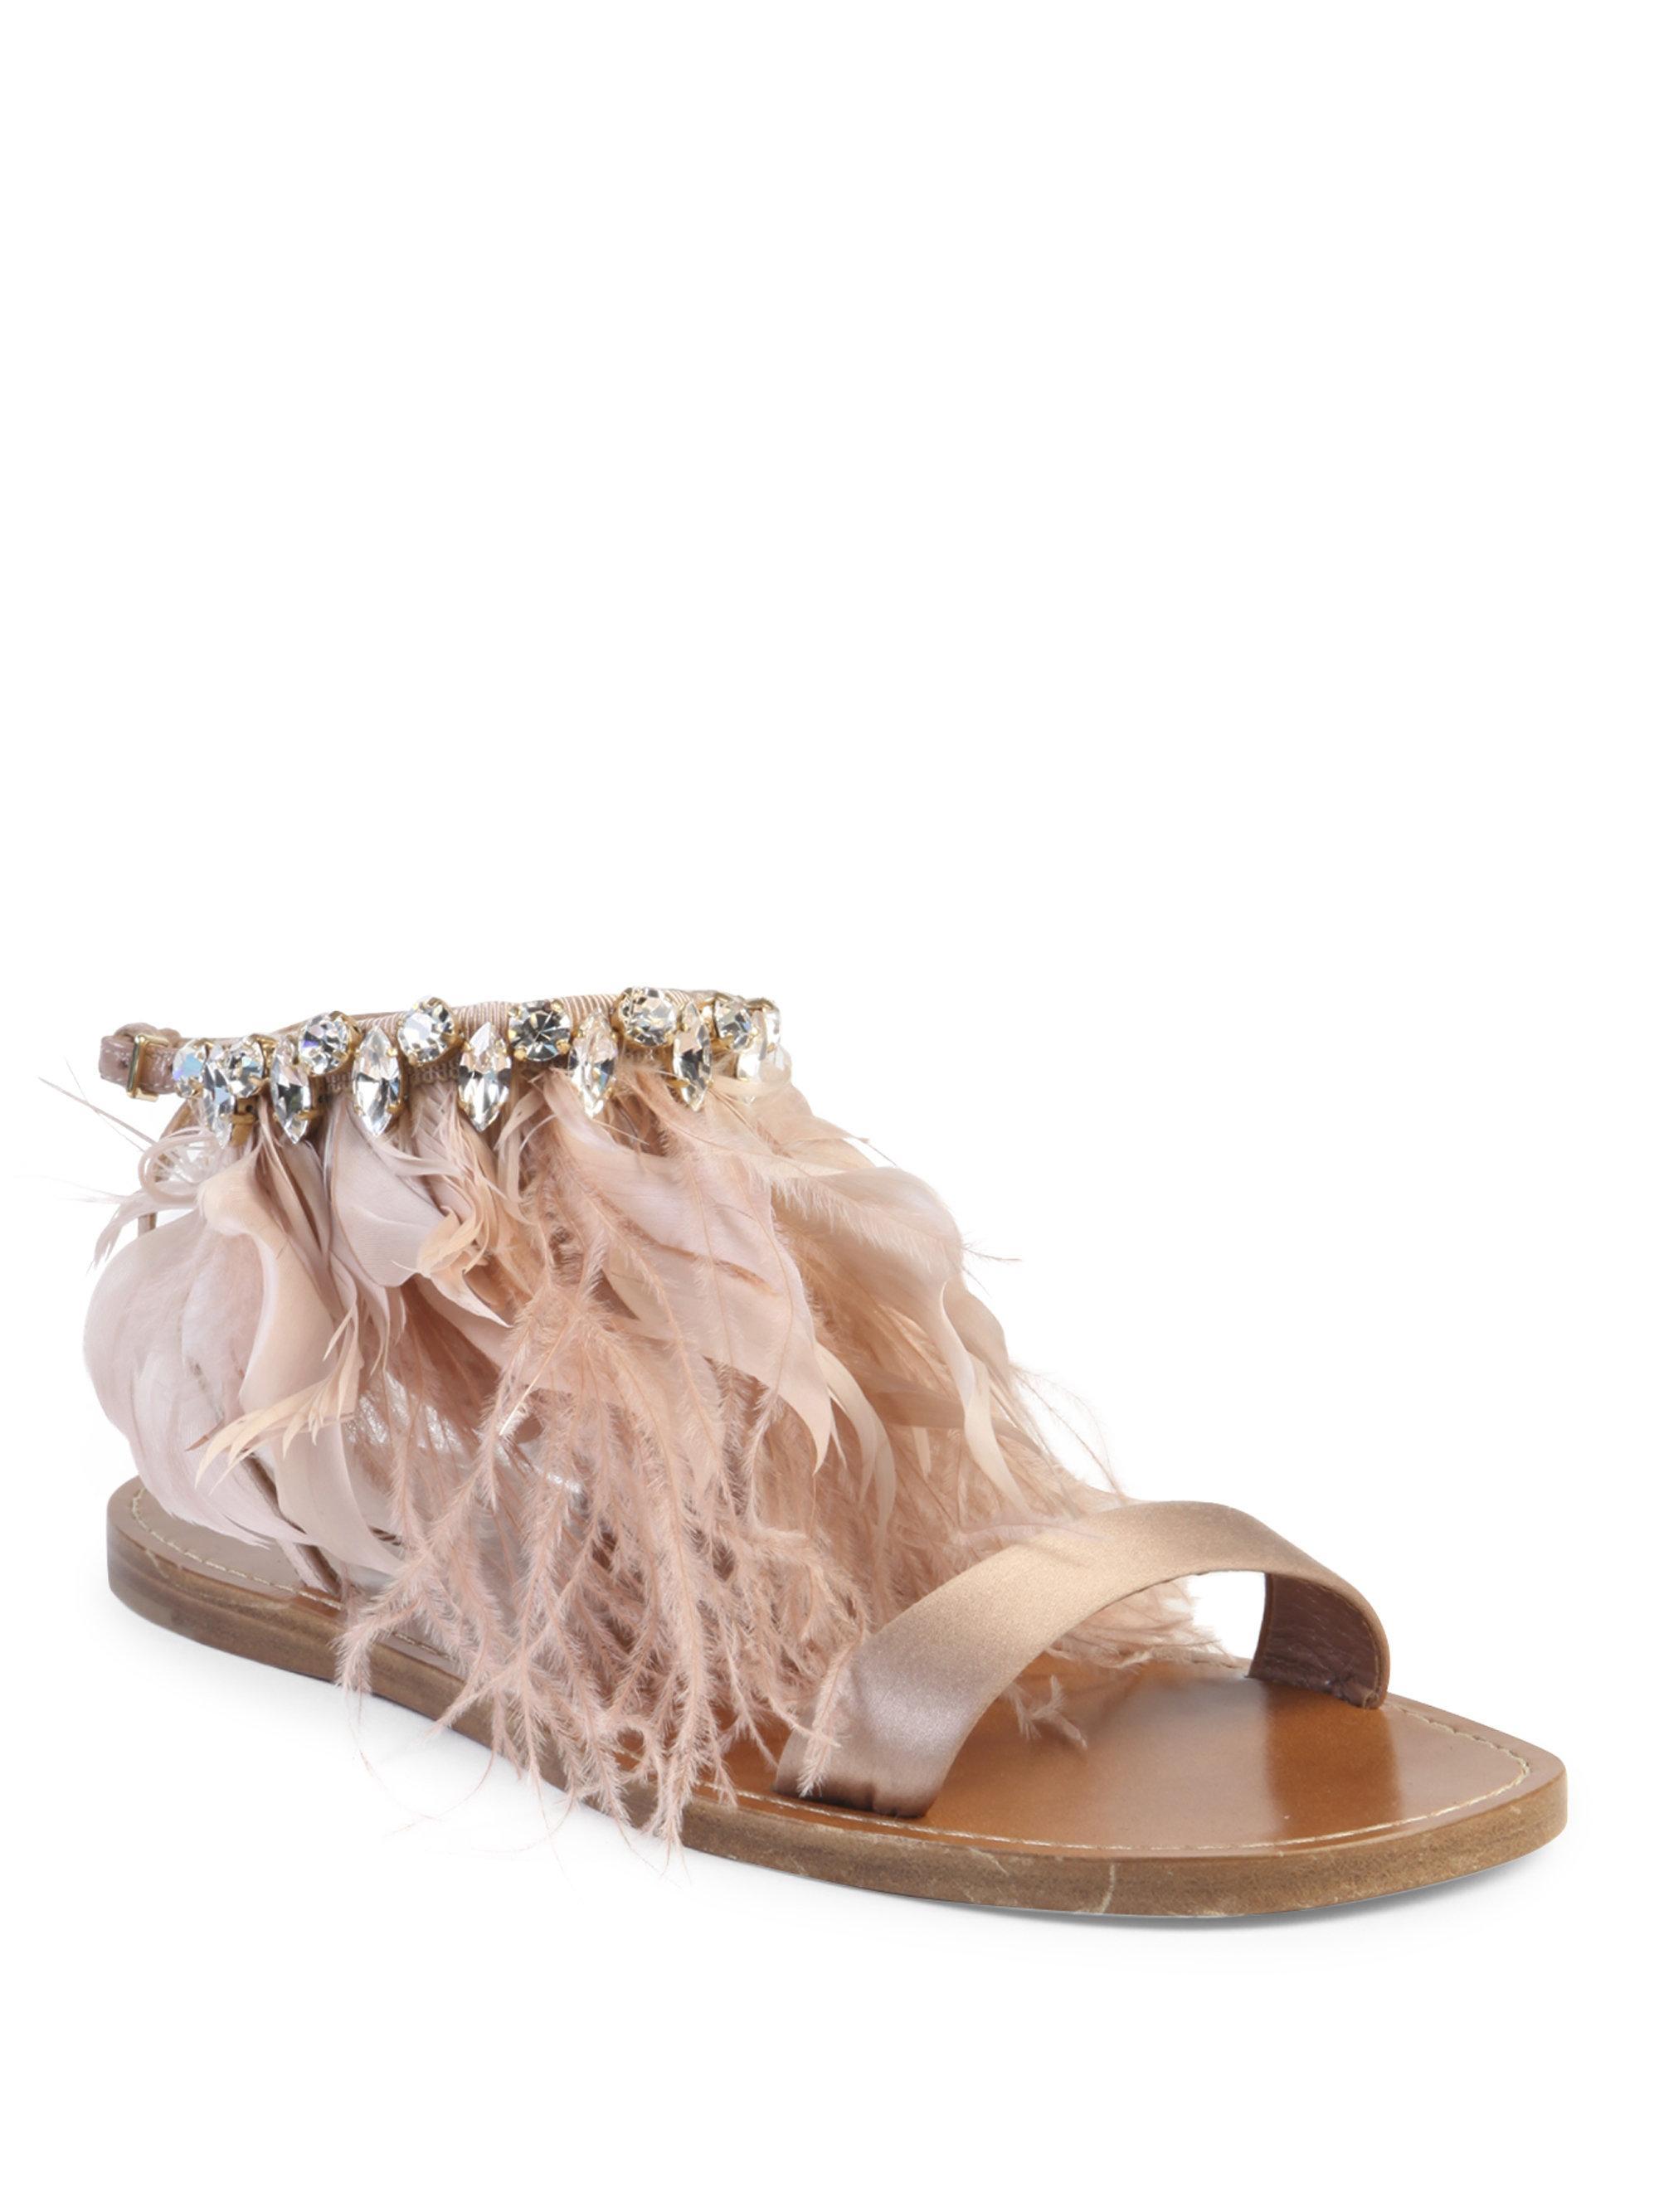 530f3a87ff5c87 Lyst - Miu Miu Jeweled Feather   Satin Sandal in Pink